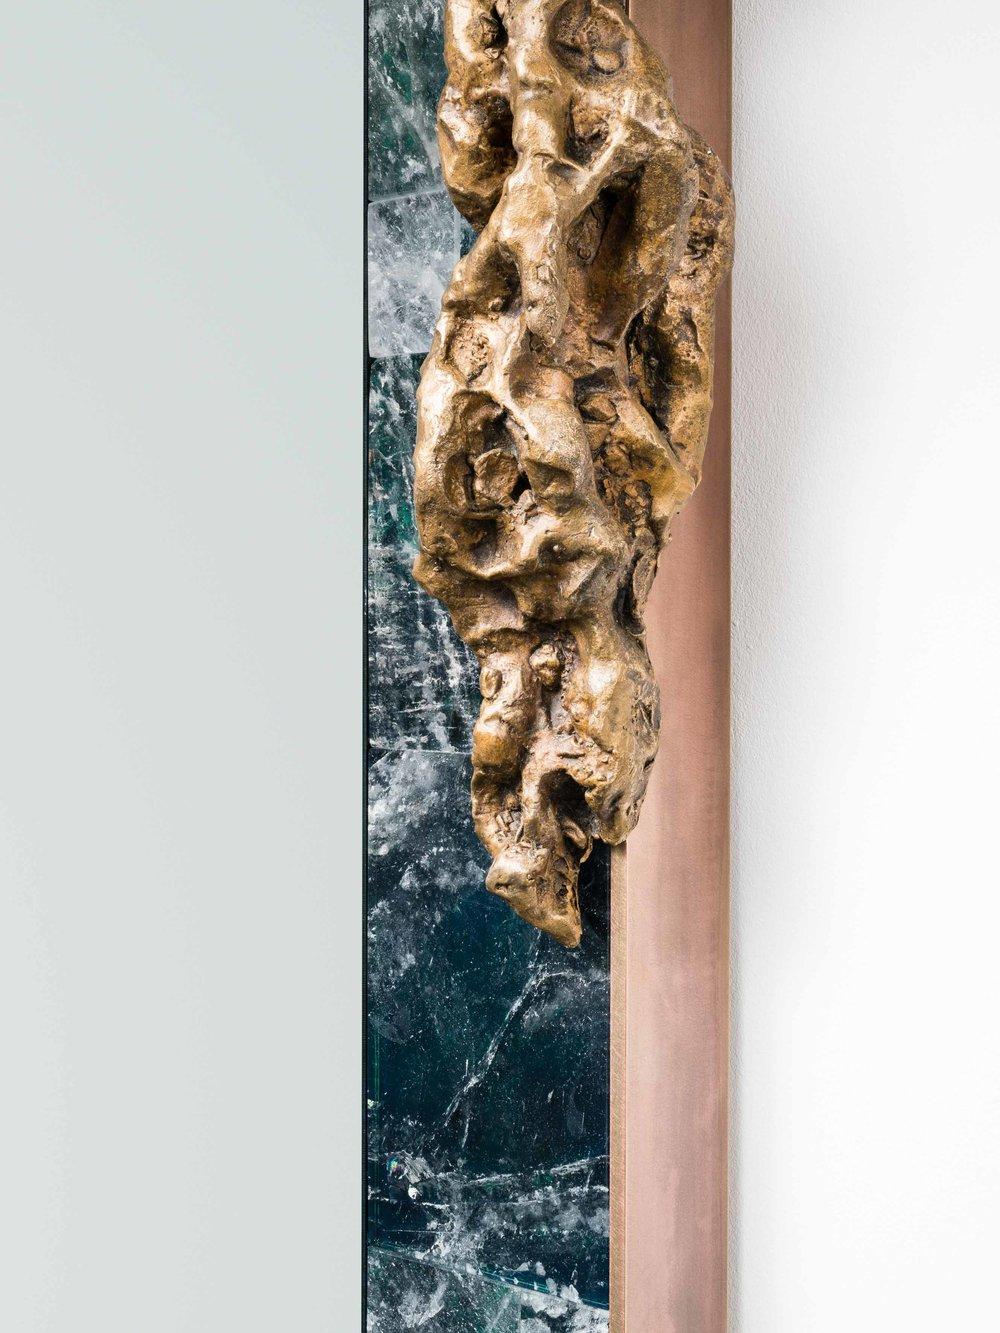 2. MB Mirror 'Rock Crystal Emerald' (detail).jpg